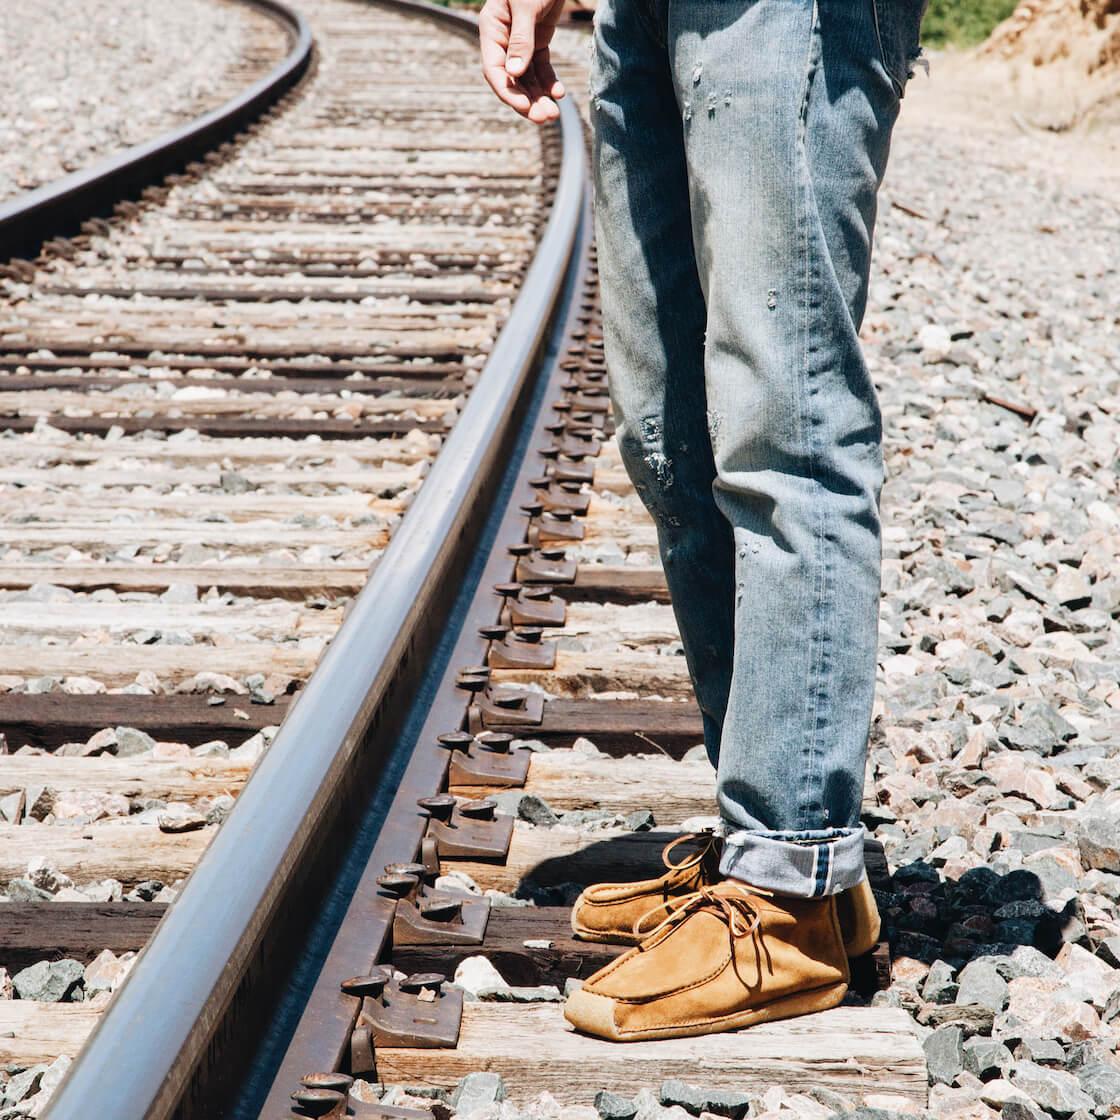 yuketen yuks type 4 mocassin boots with LVC jeans on body